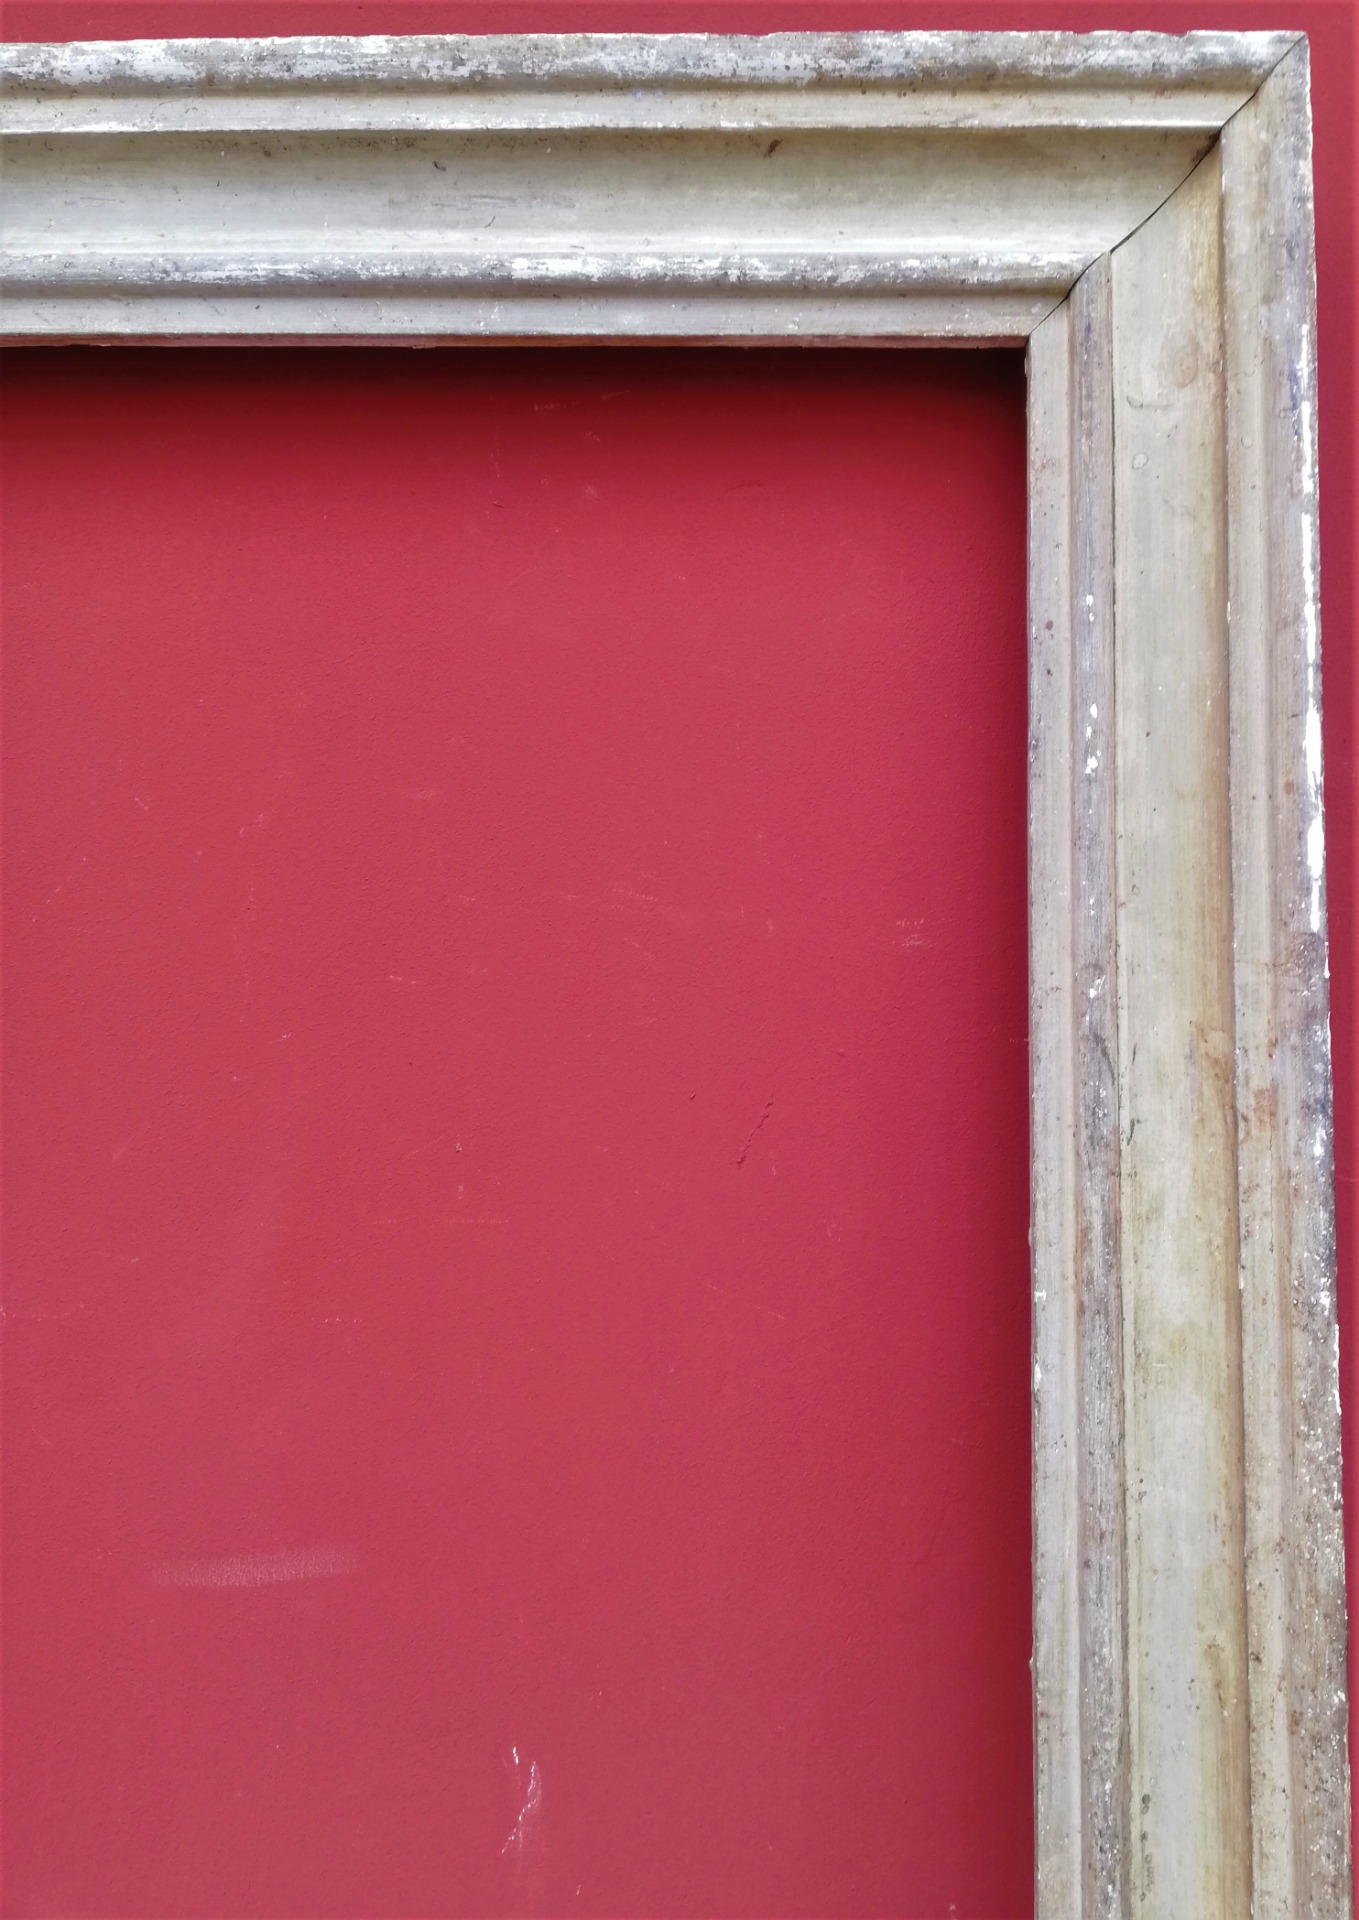 thumb2|cornice laccata